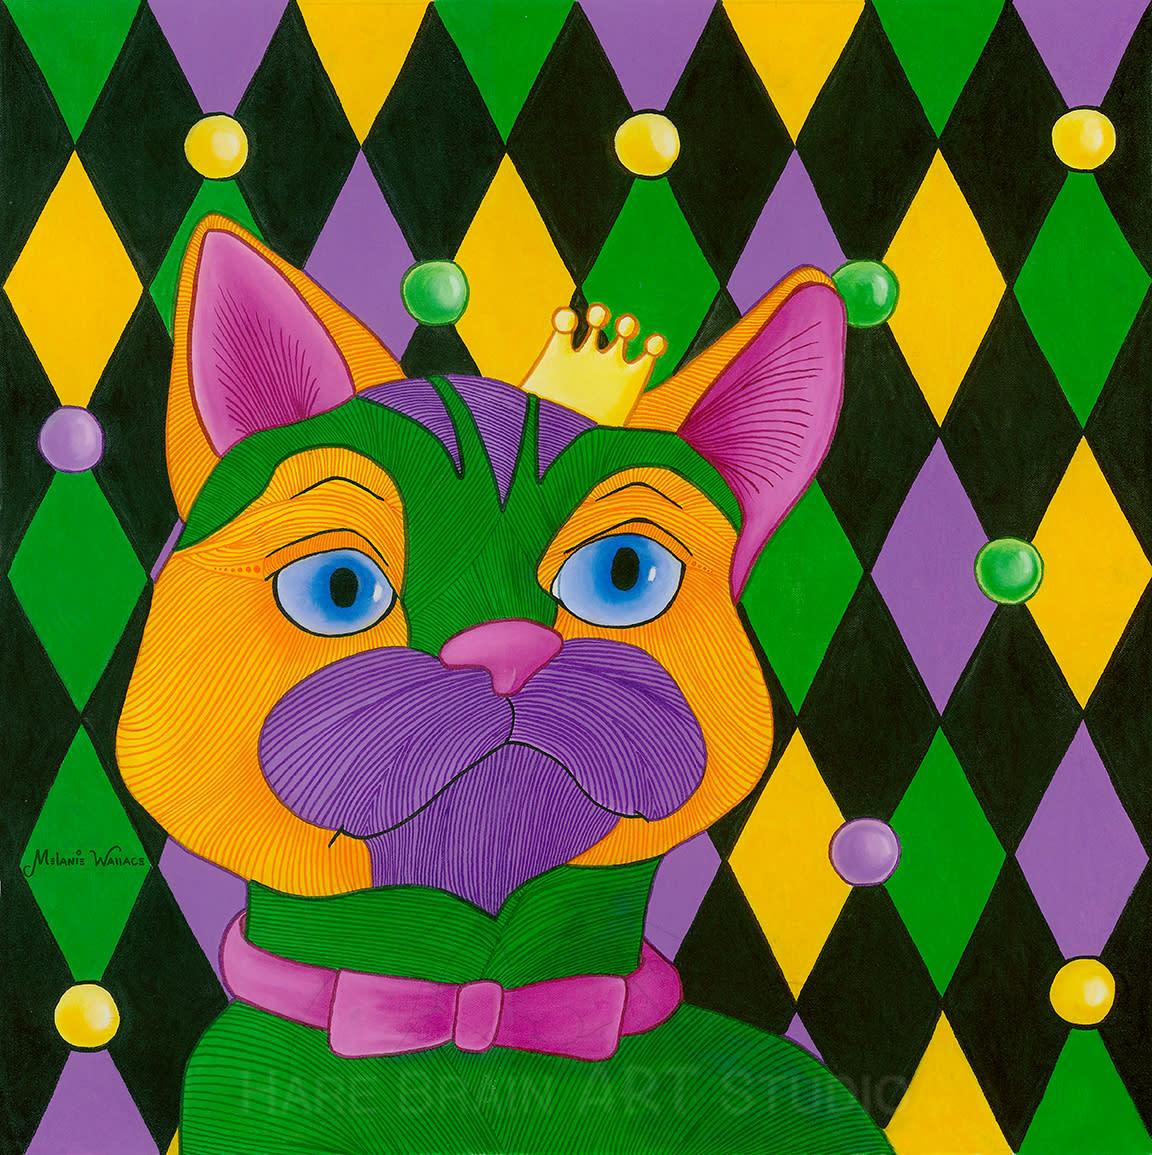 Mambo kitty kitty king llmuio